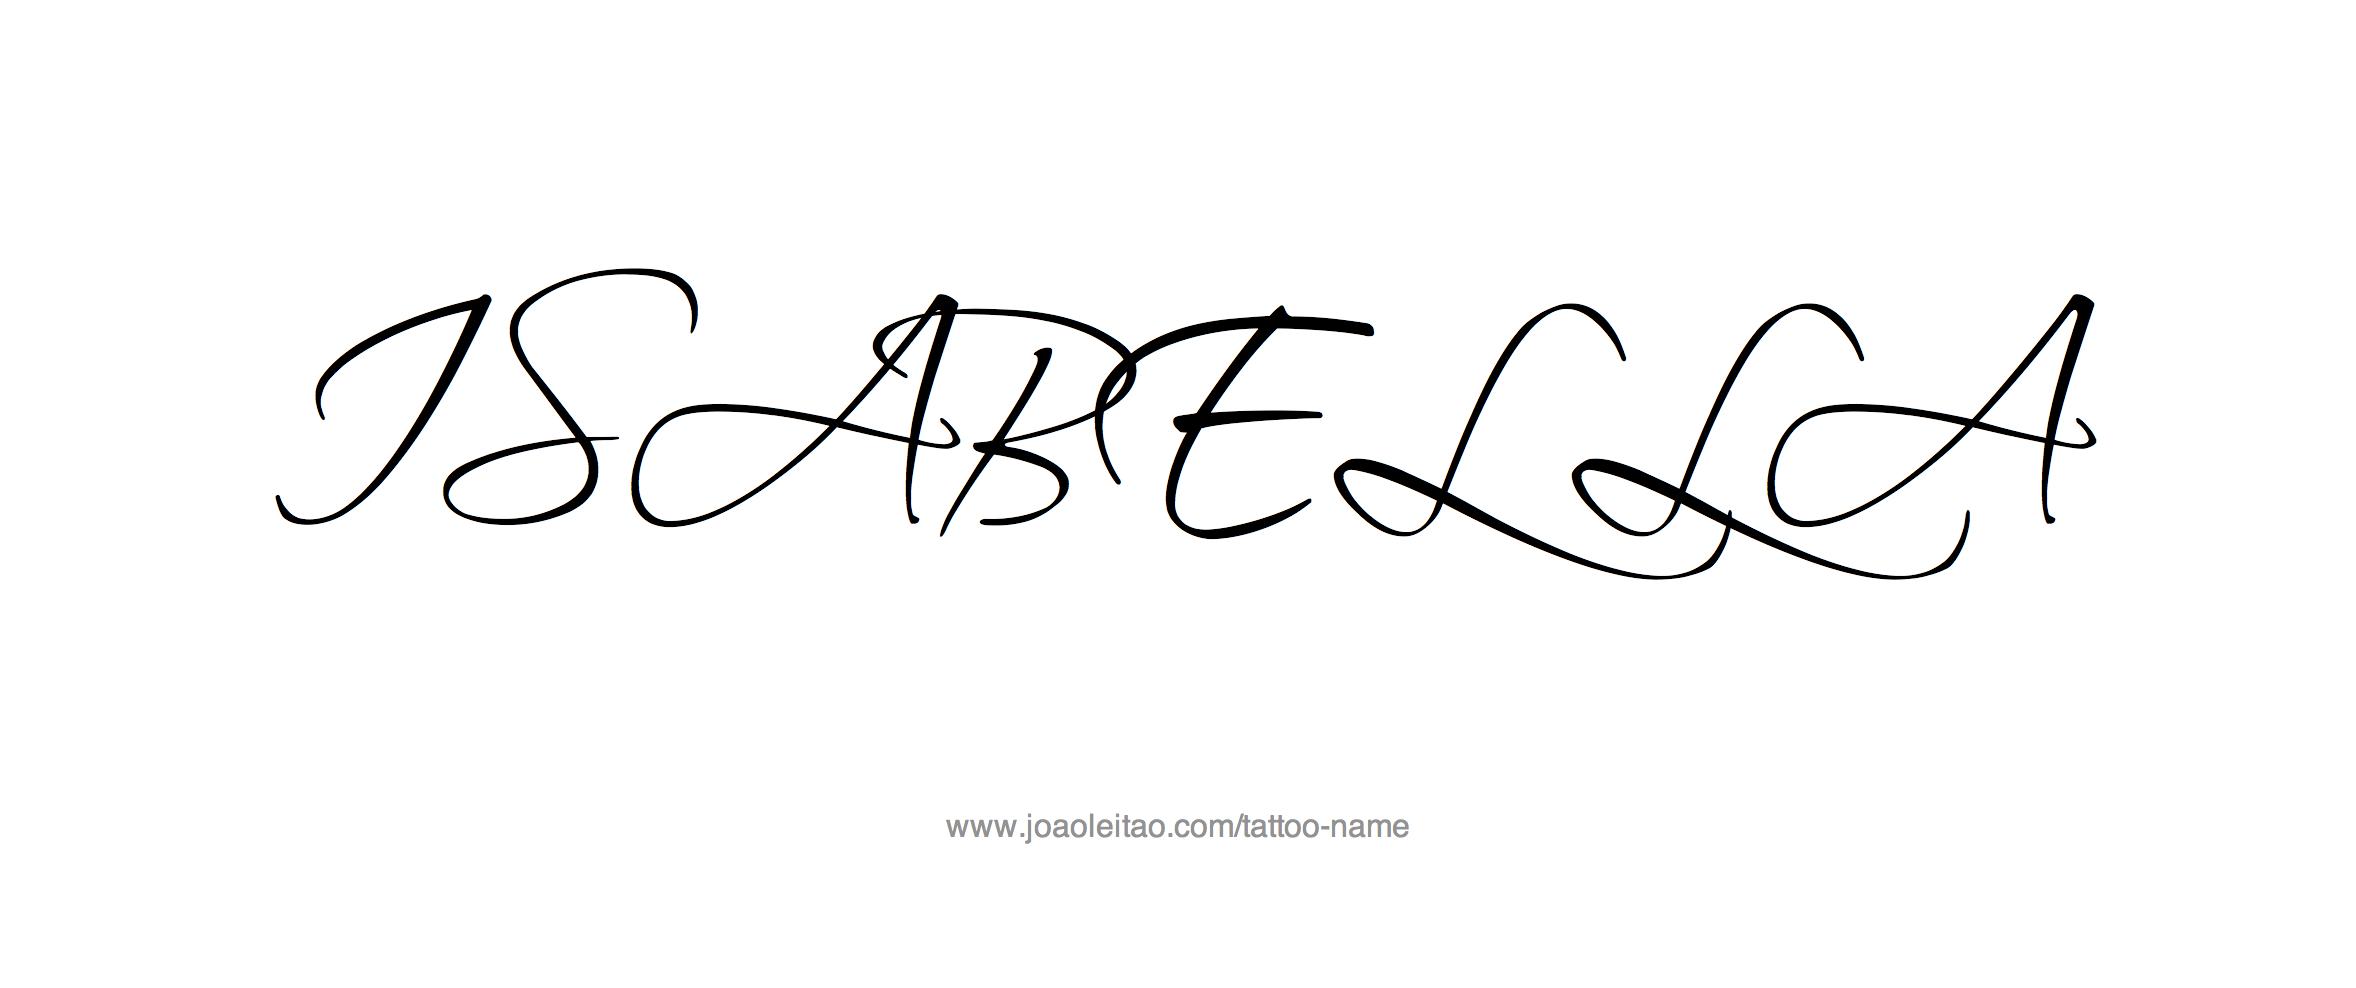 isabella name tattoo designs nombres dise o y dise os tatuajes. Black Bedroom Furniture Sets. Home Design Ideas